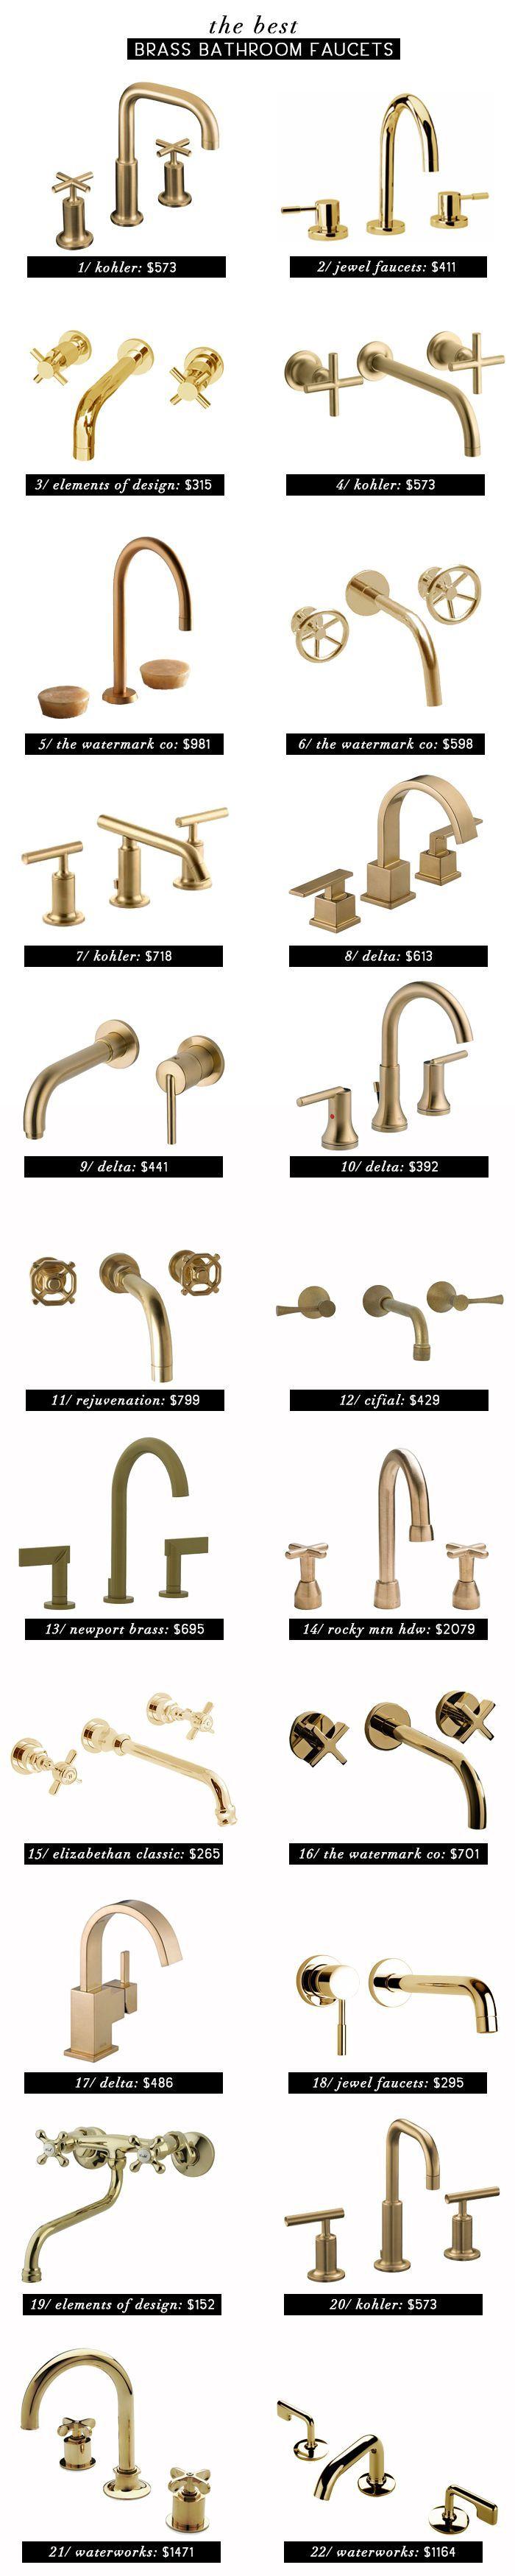 Brass Faucets A Roundup Brass Faucet Beautiful Bathrooms